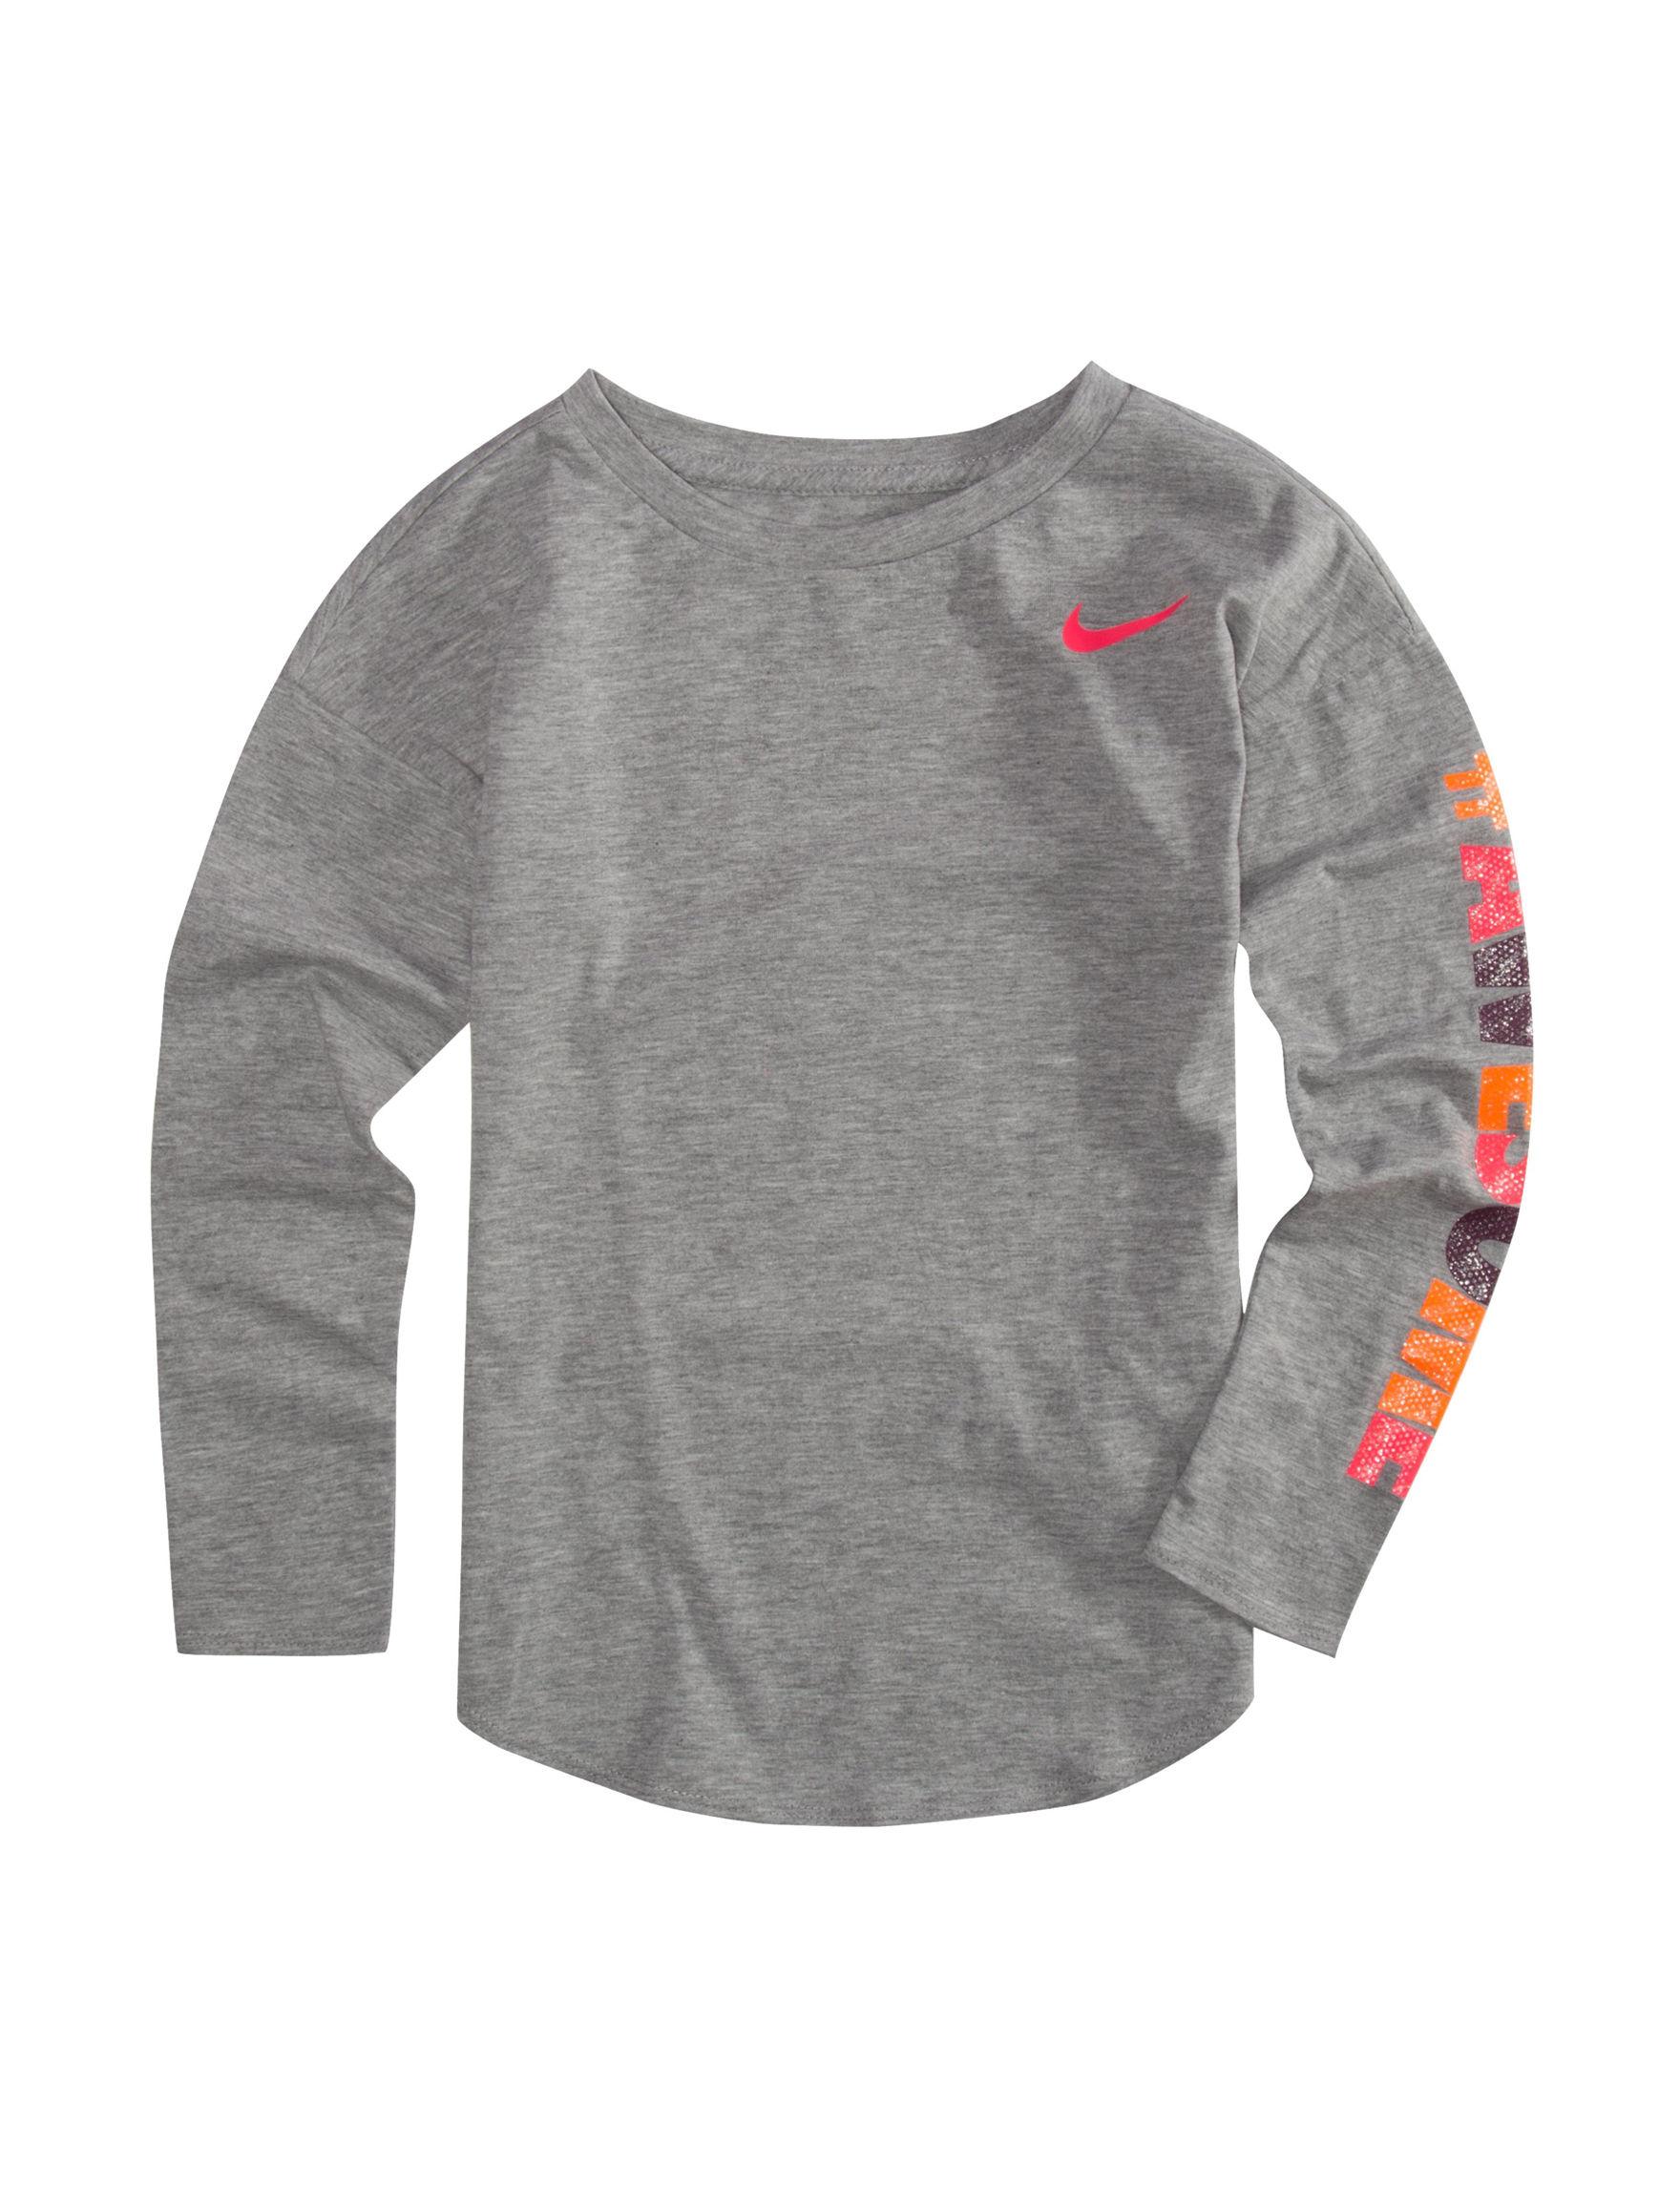 Nike Grey Tees & Tanks